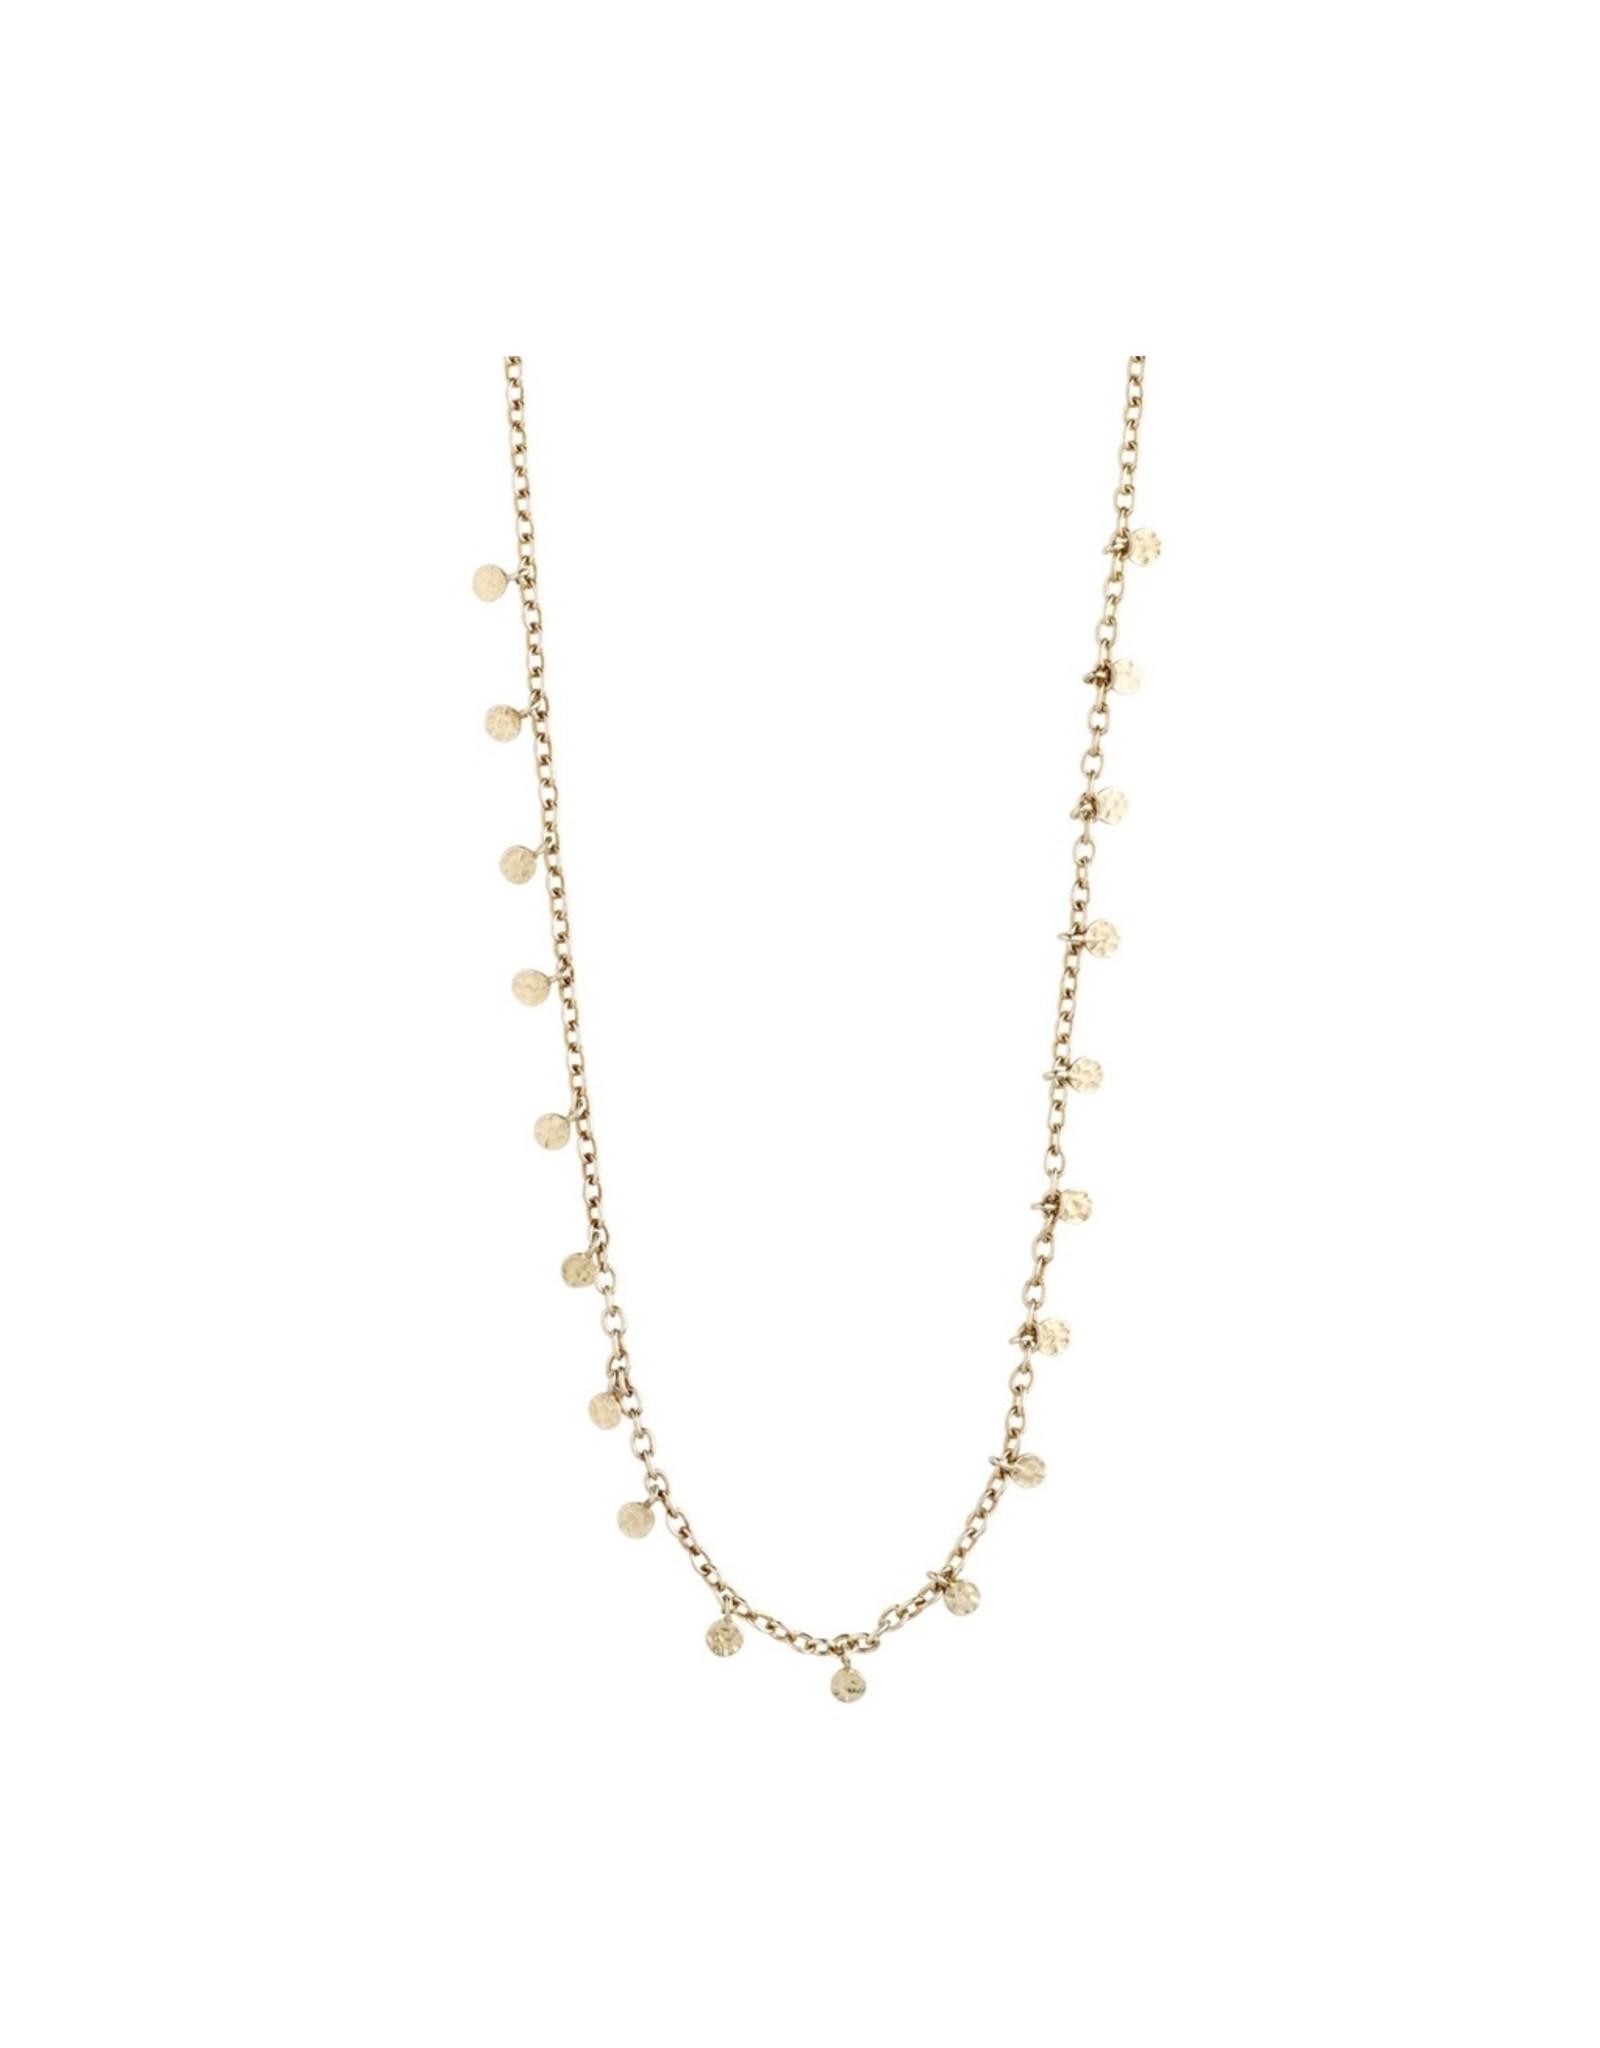 Pilgrim Pilgrim Necklace, Panna, Gold Plated